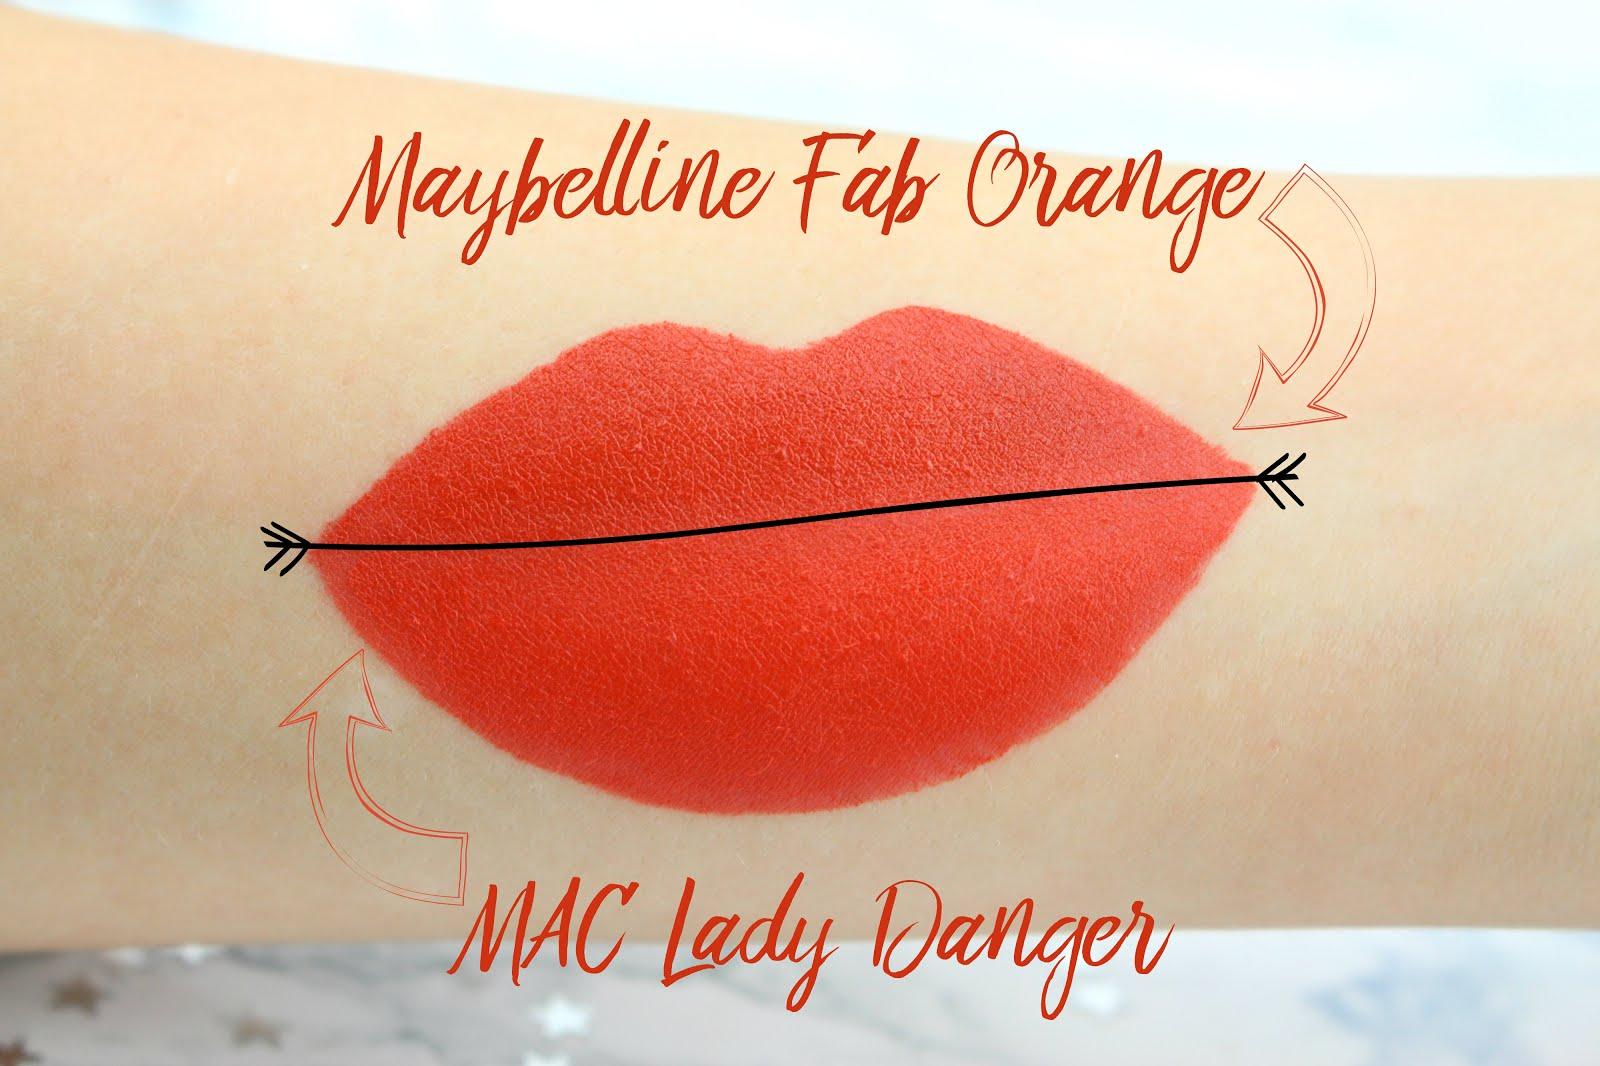 mac lady danger, mac lady danger lipstick, mac lady danger dupe, mac lady danger lipstick dupe, maybelline colordrama, maybelline colordrama fab orange, maybelline fab orange, nelly ray, nelly ray blog, different is better